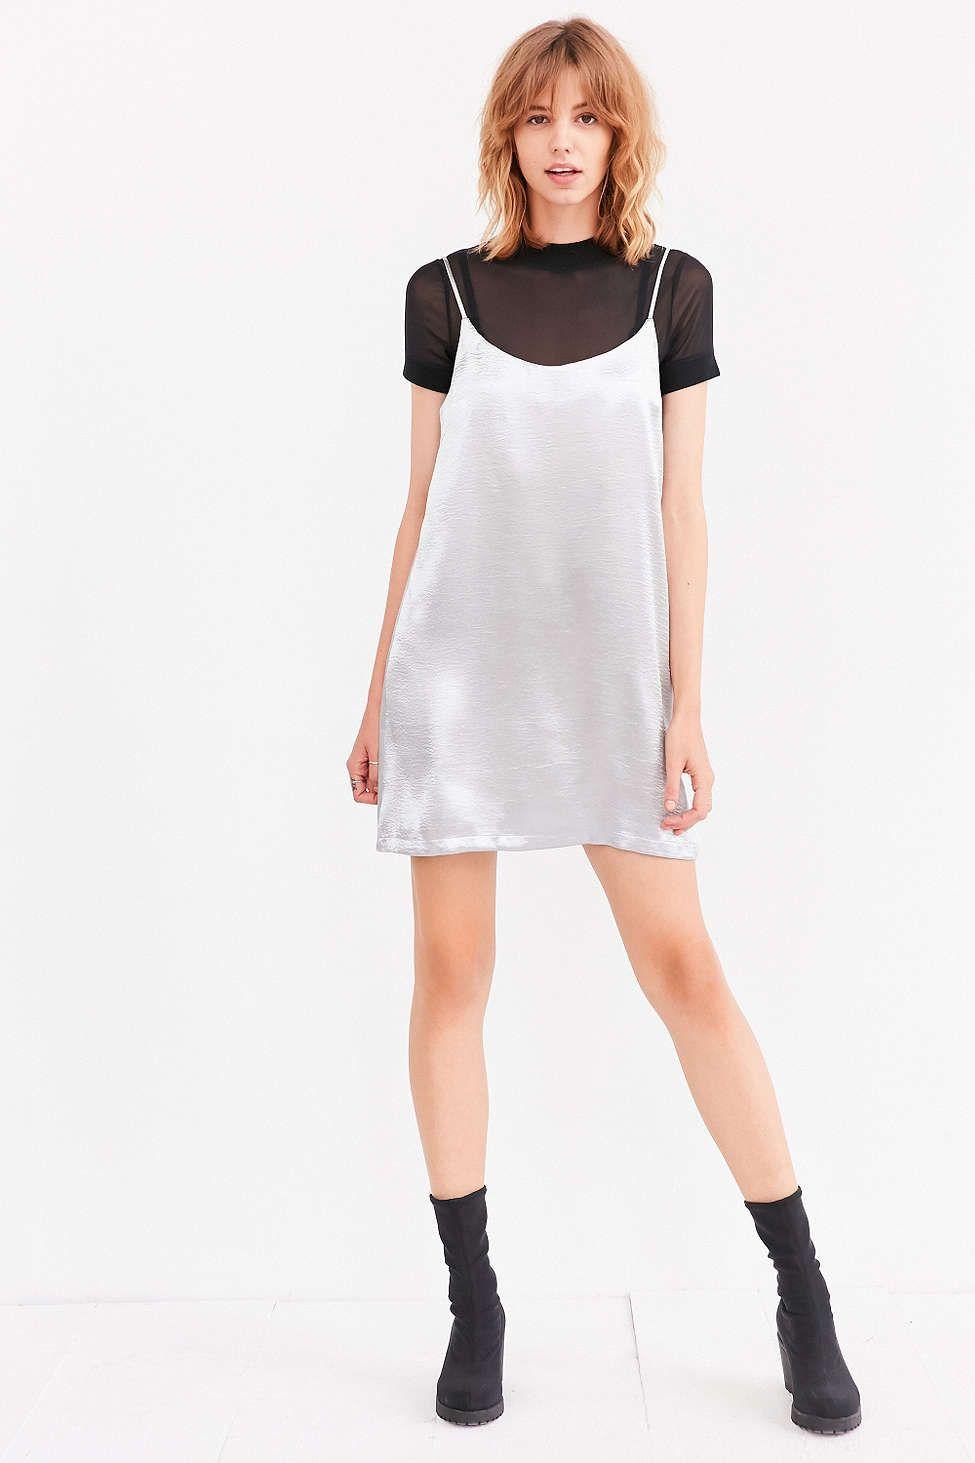 Silence + Noise Satin Shine Mini Slip Dress   Boho, Visual kei ...